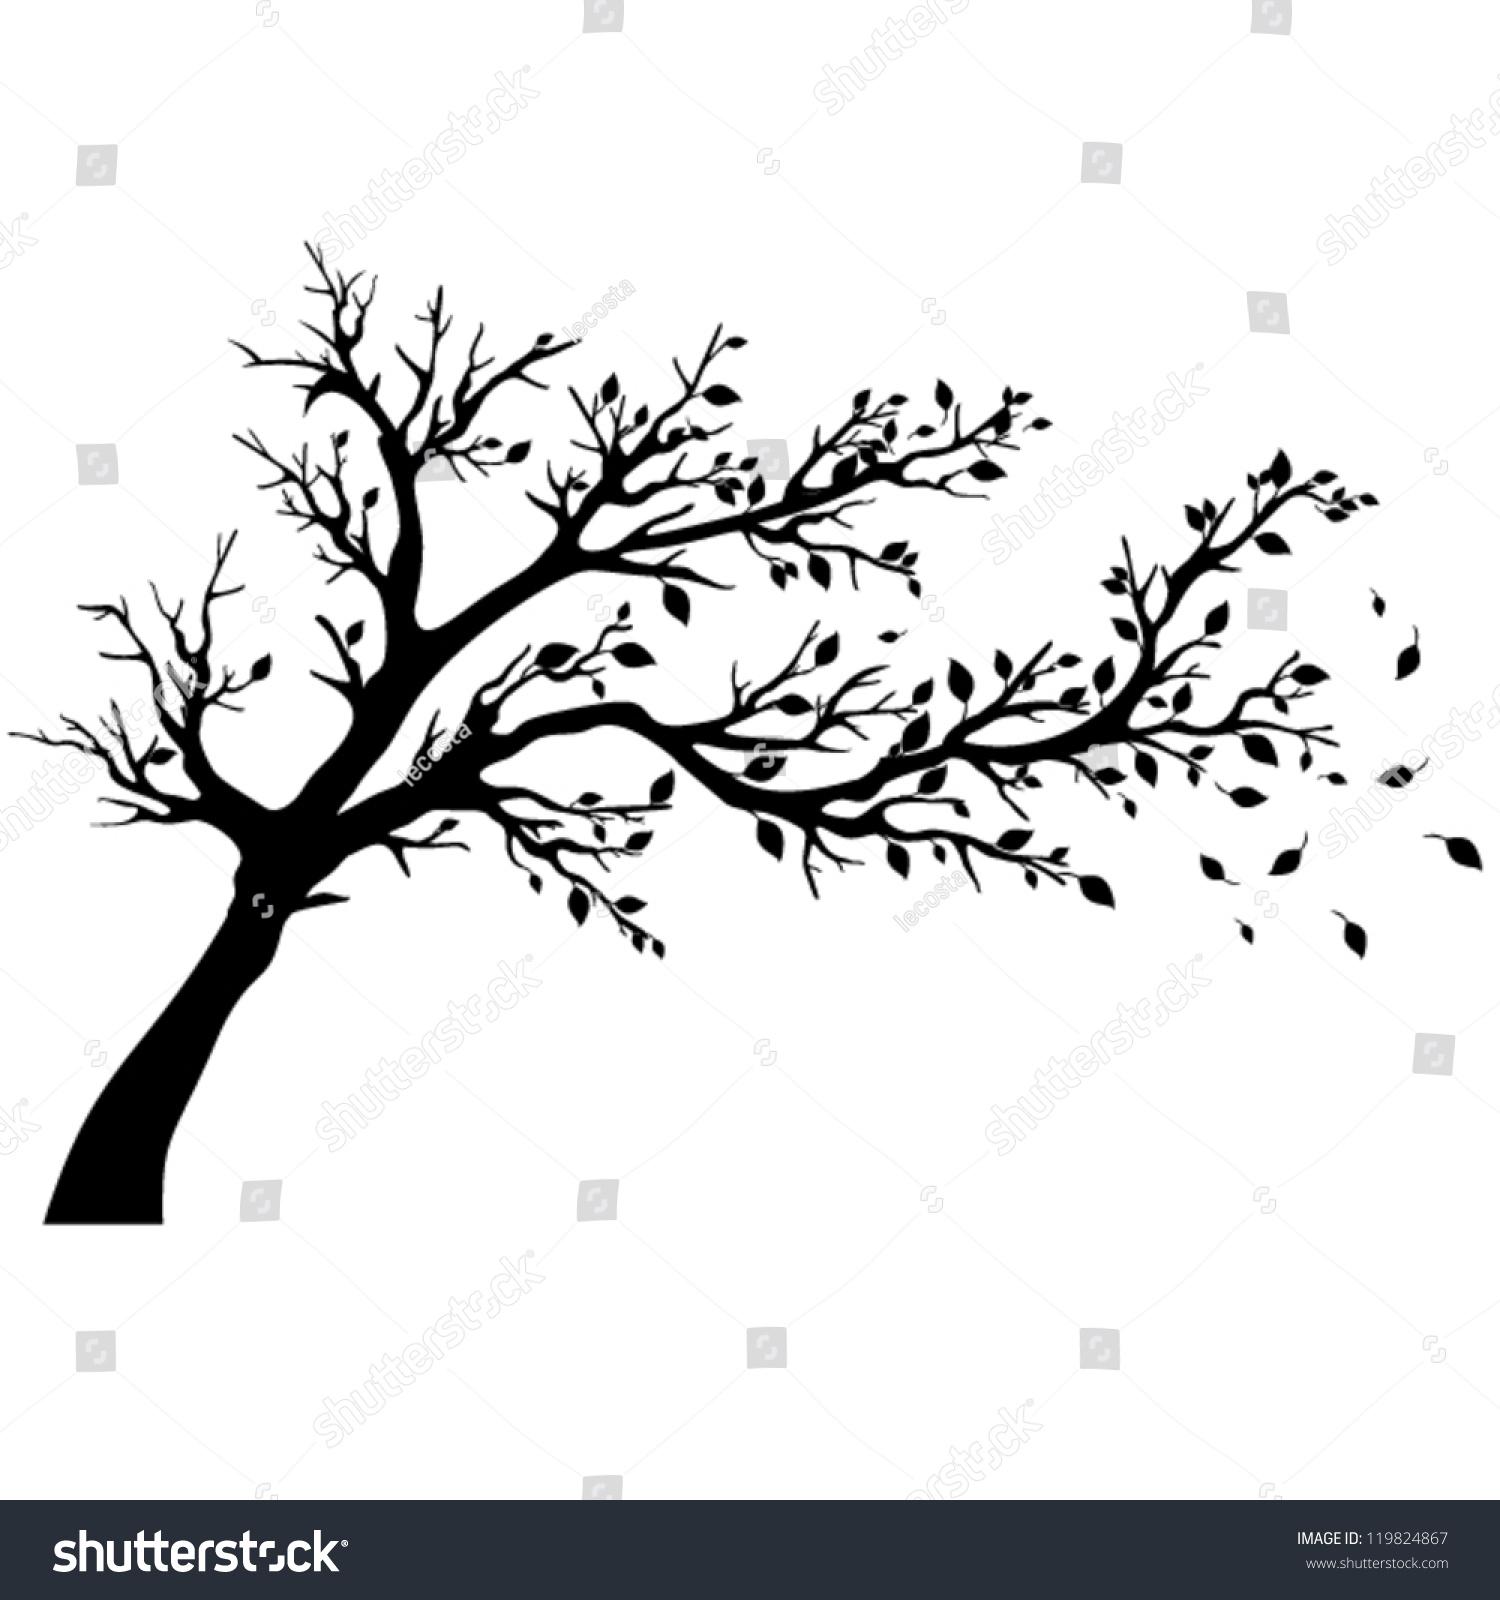 Vector Illustration Tree: Tree Silhouettes Vector Illustration Stock Vector